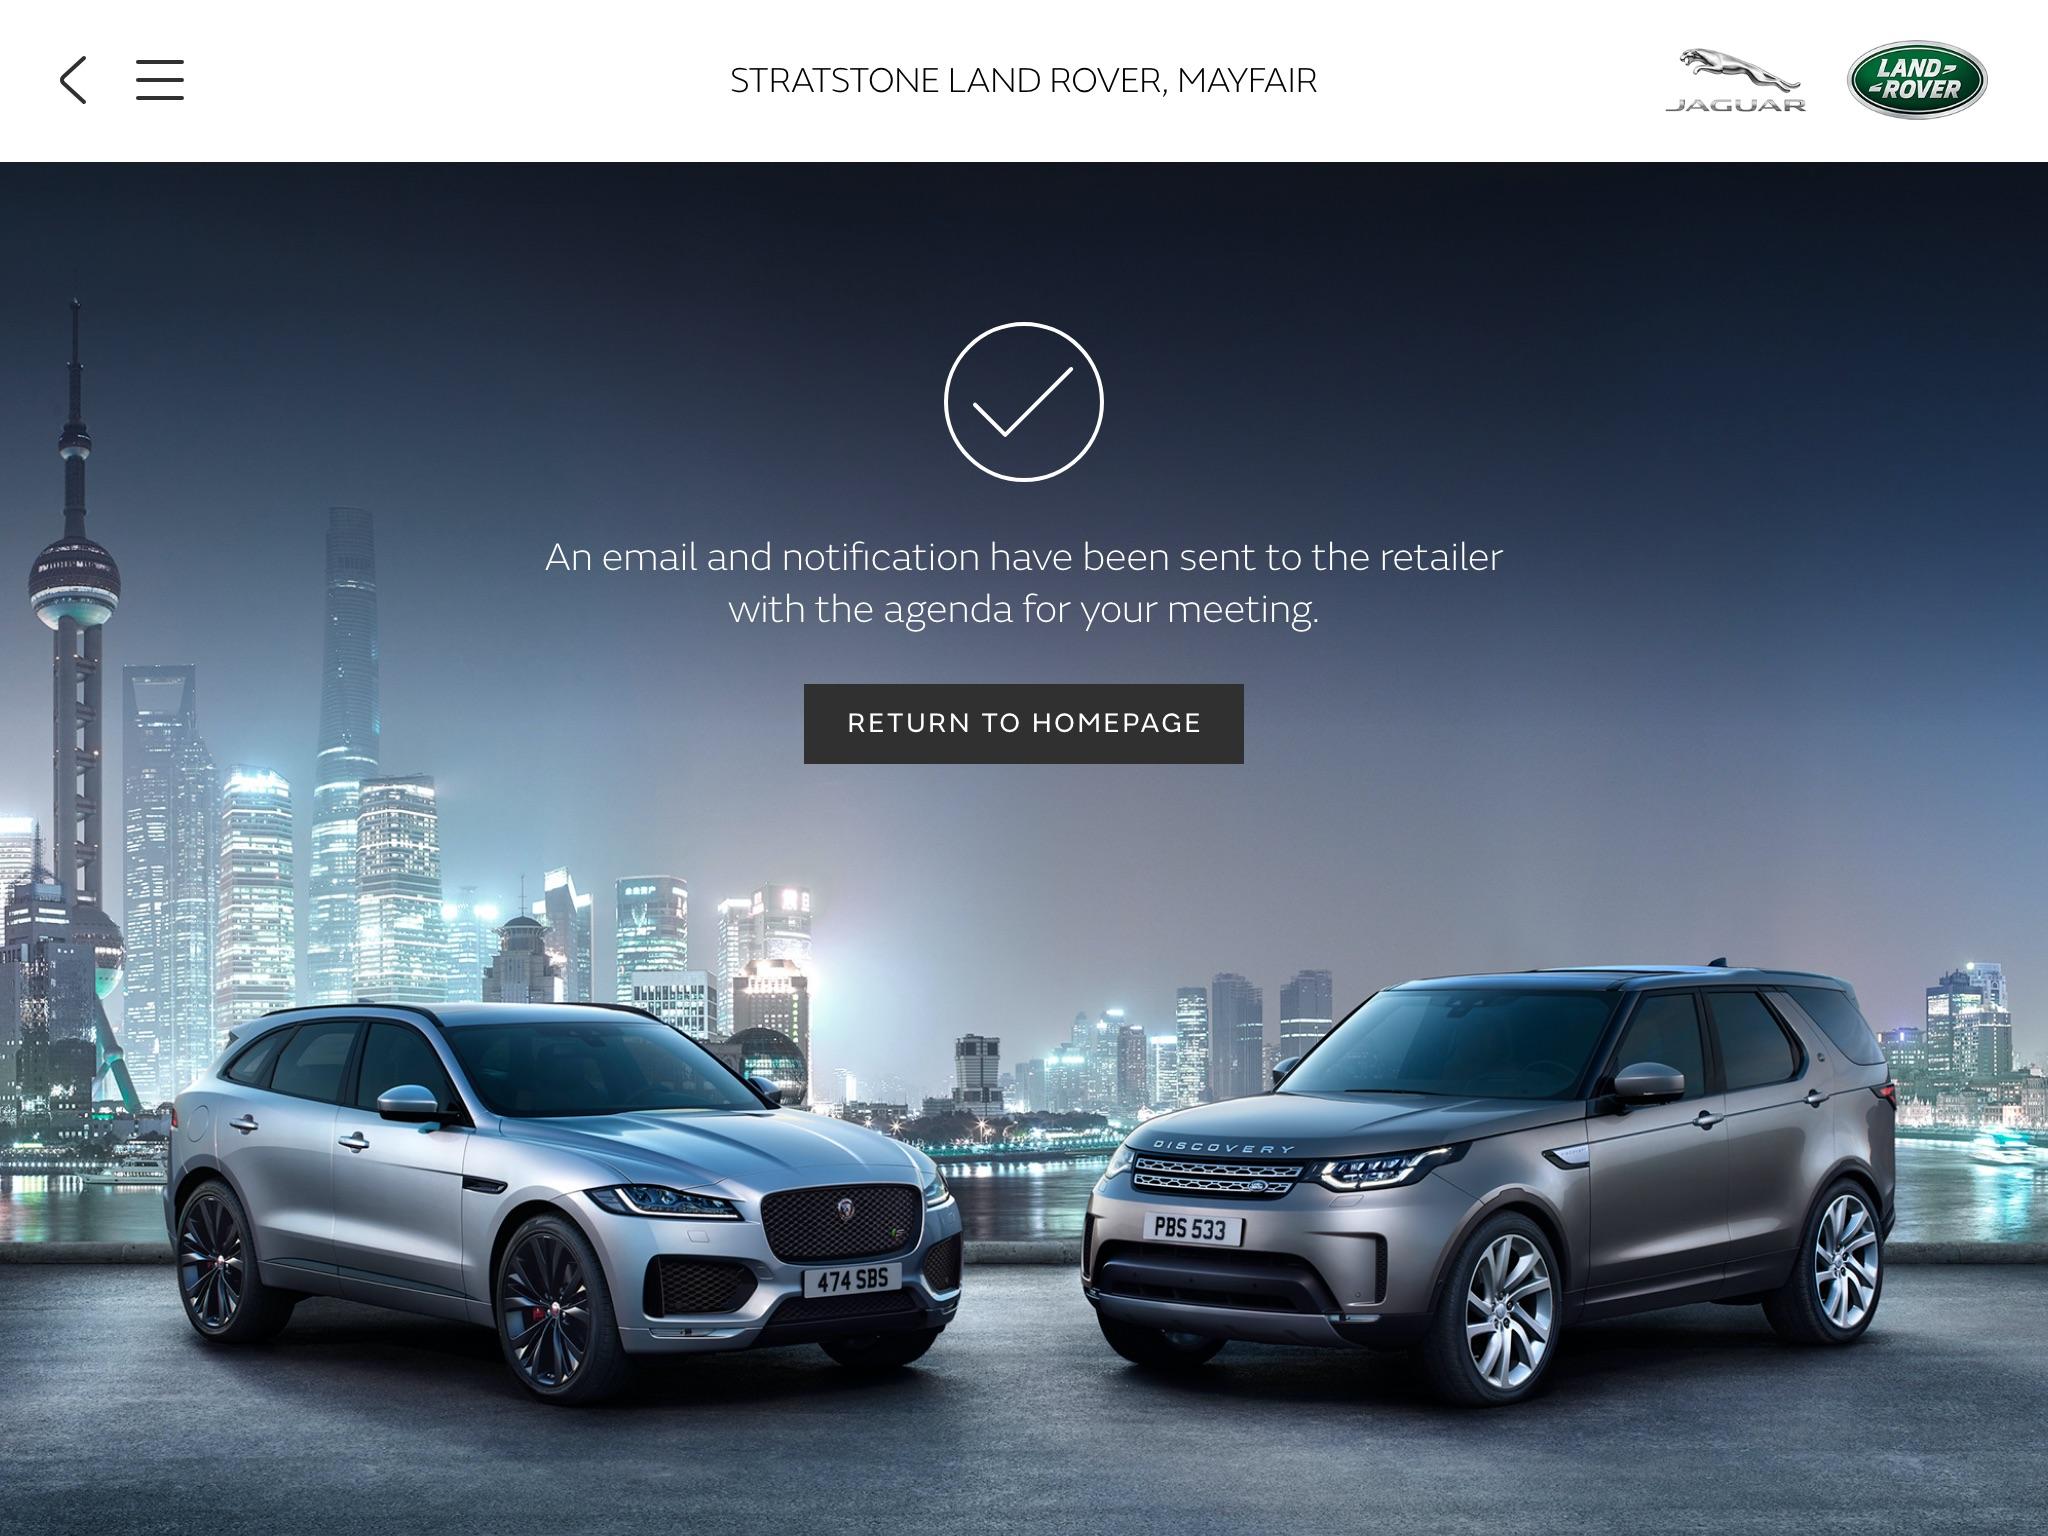 Jaguar Land Rover app